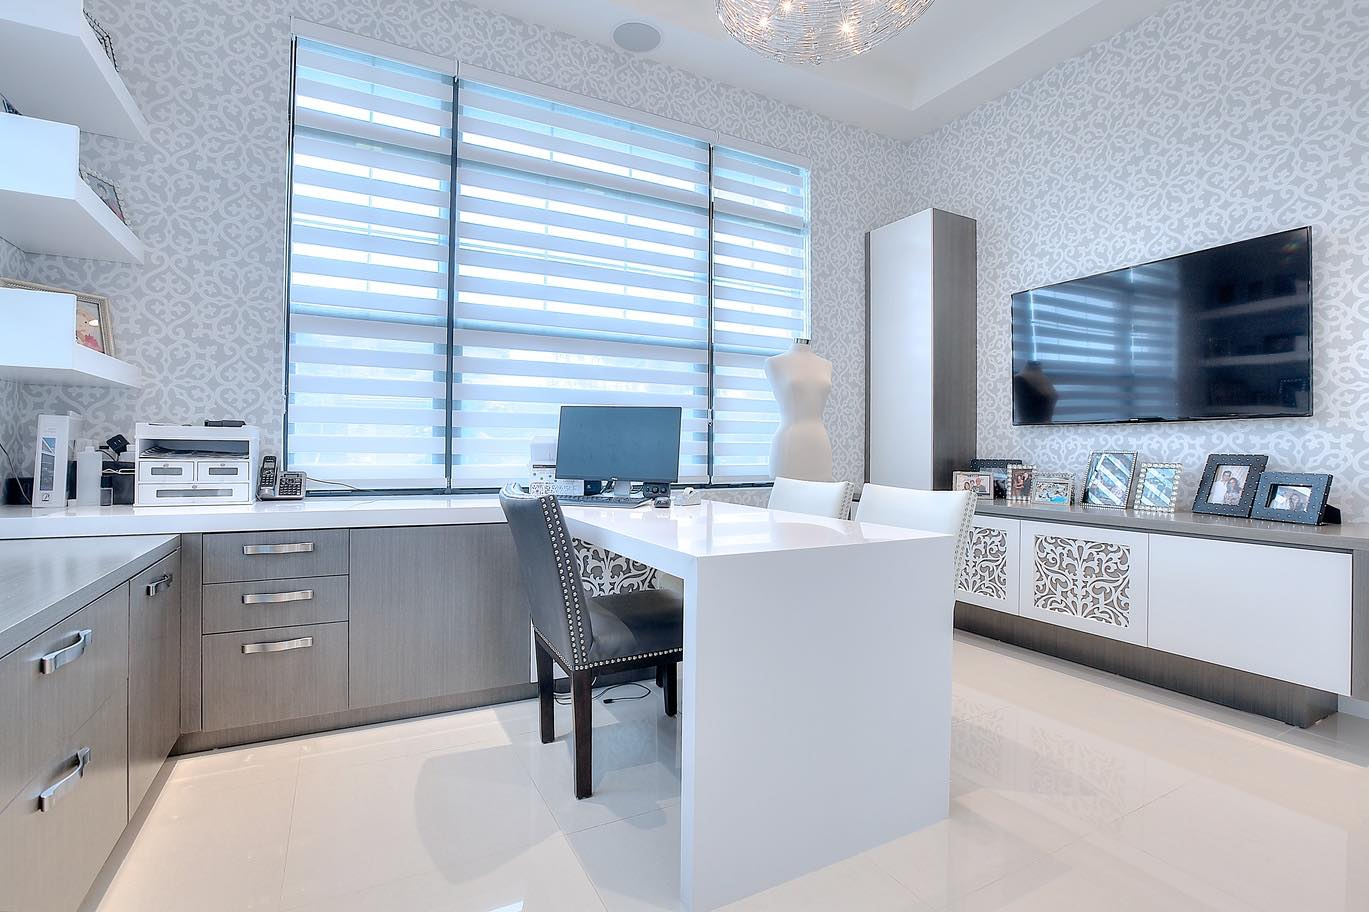 PBR Interior Design